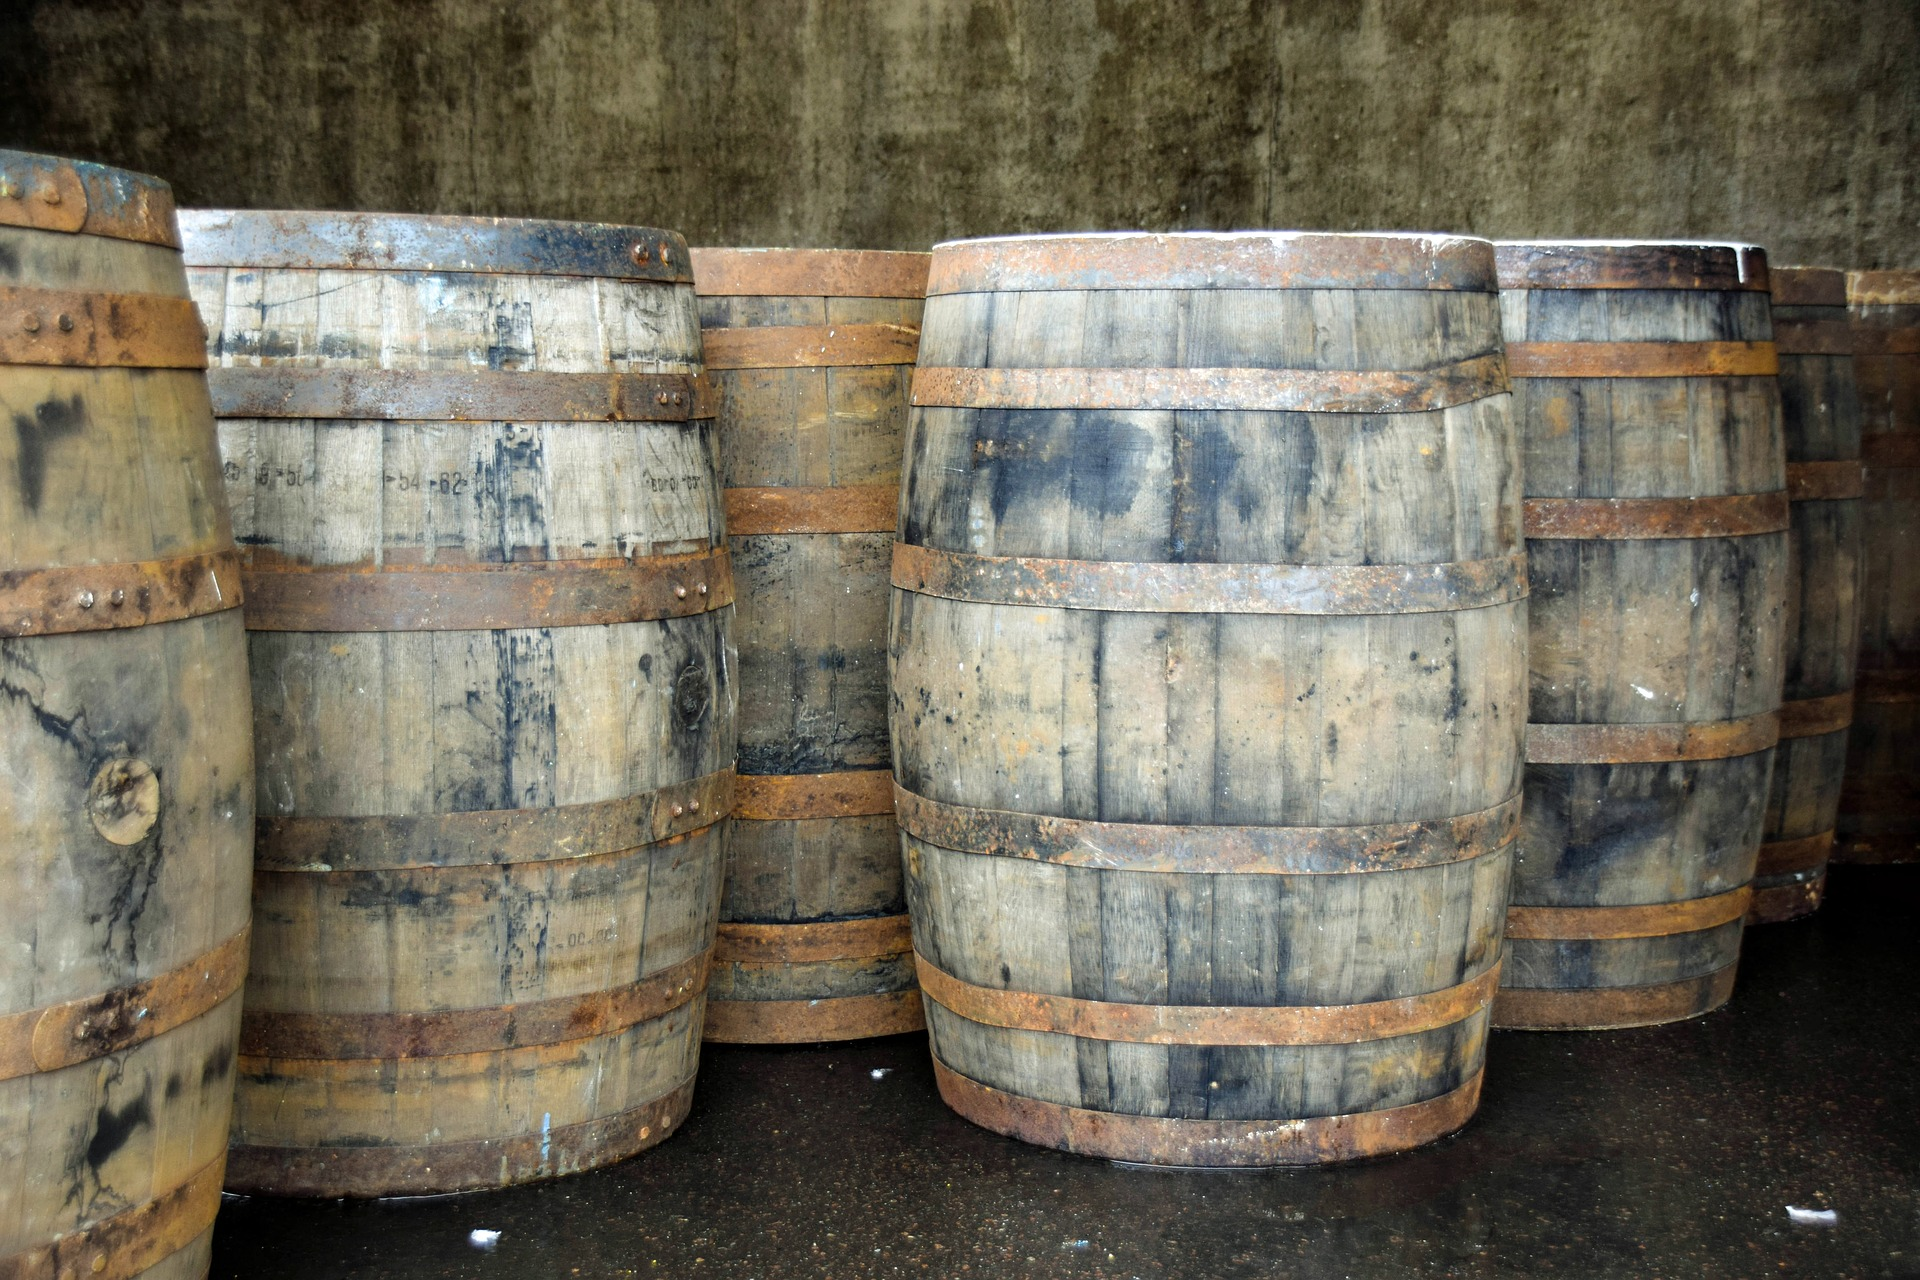 Sylt Whisky Nordseeinseln Holzfässer